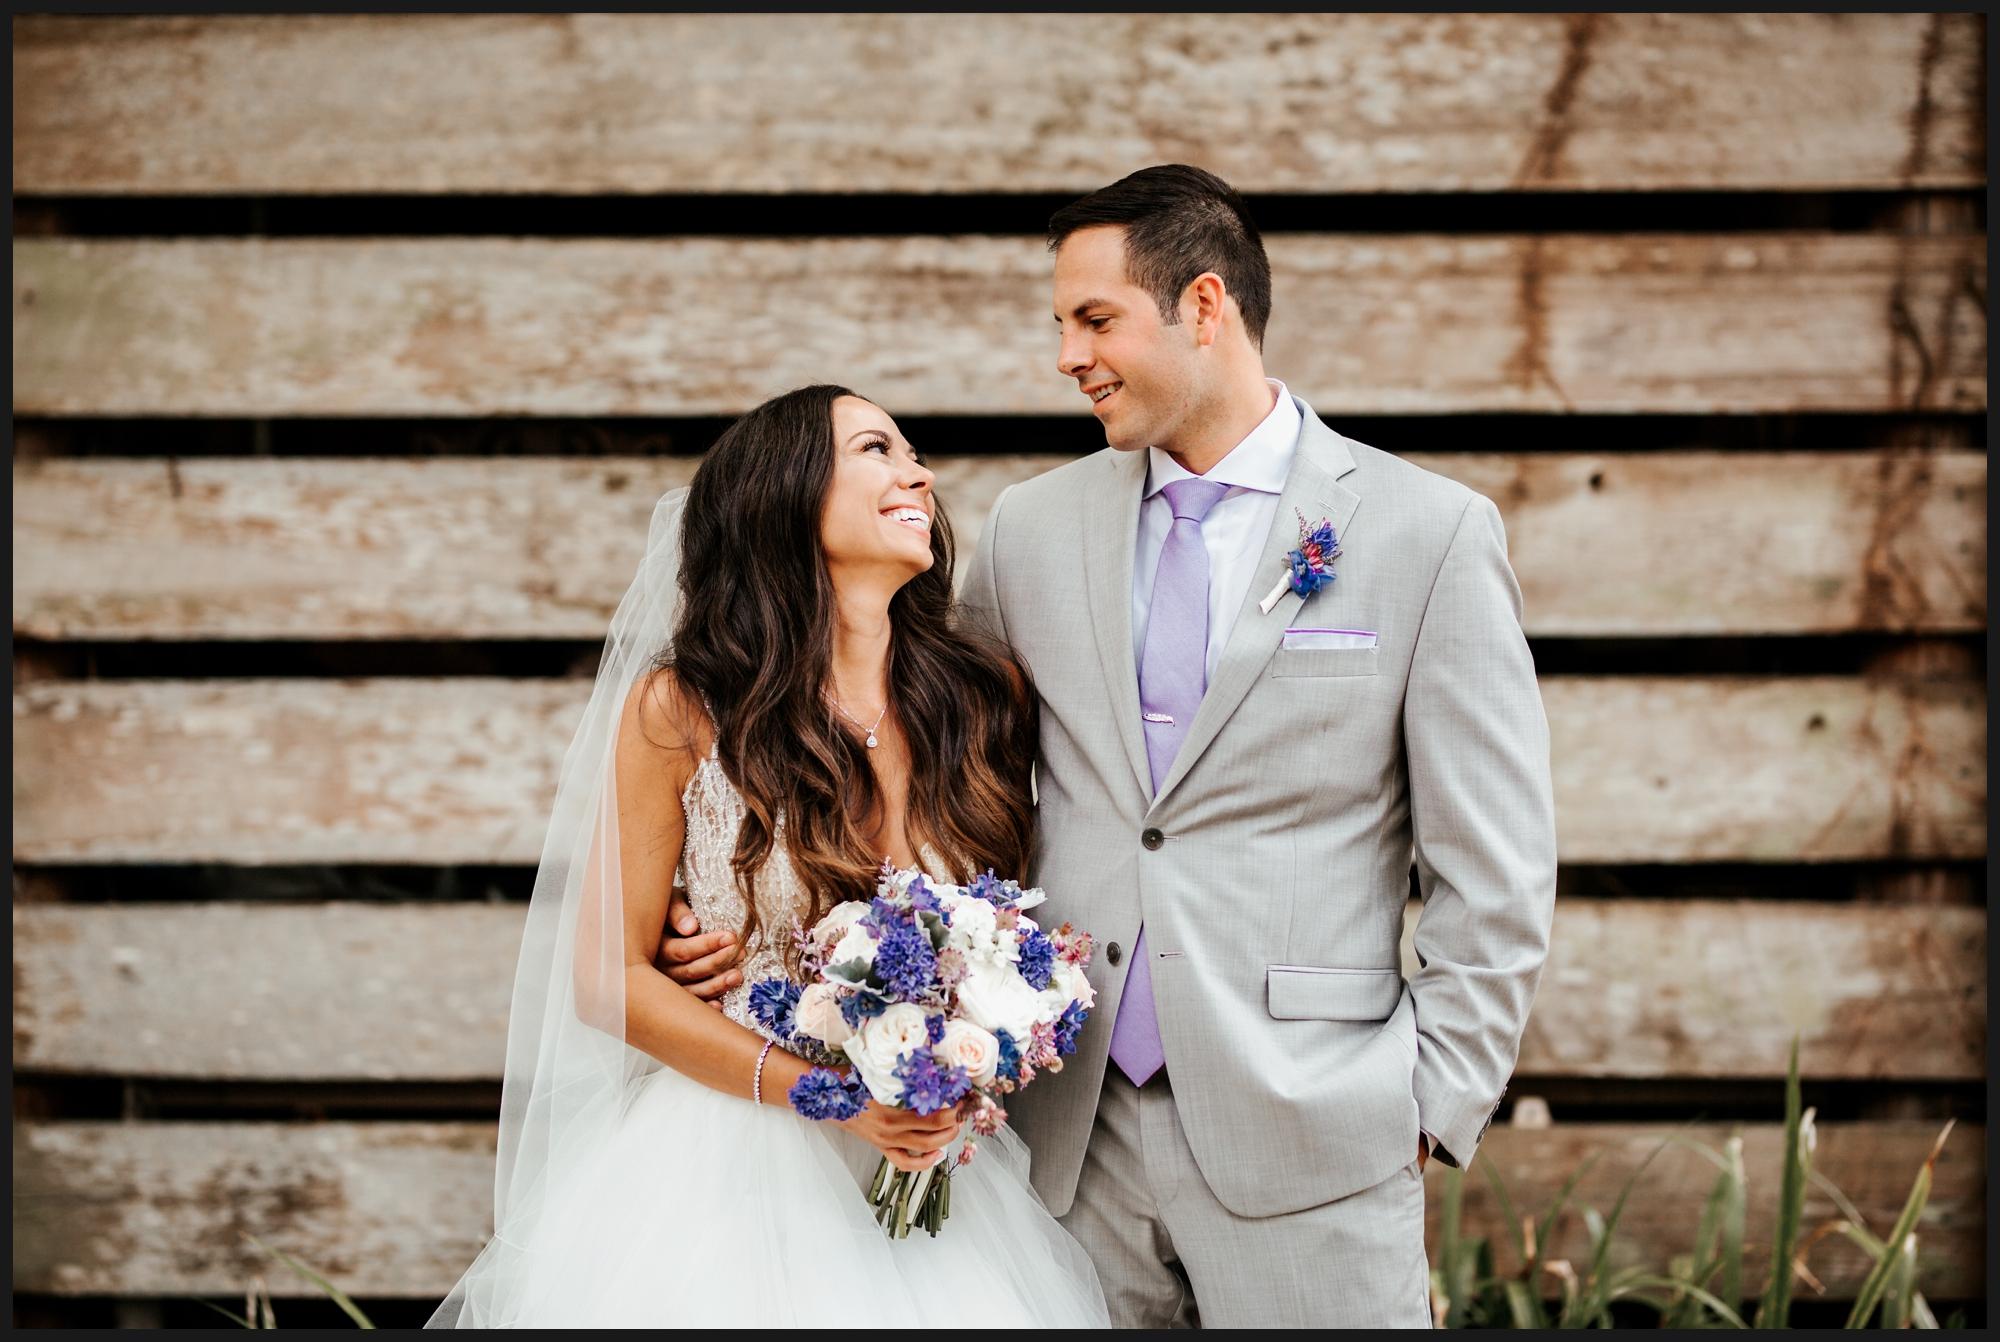 Orlando-Wedding-Photographer-destination-wedding-photographer-florida-wedding-photographer-bohemian-wedding-photographer_1598.jpg